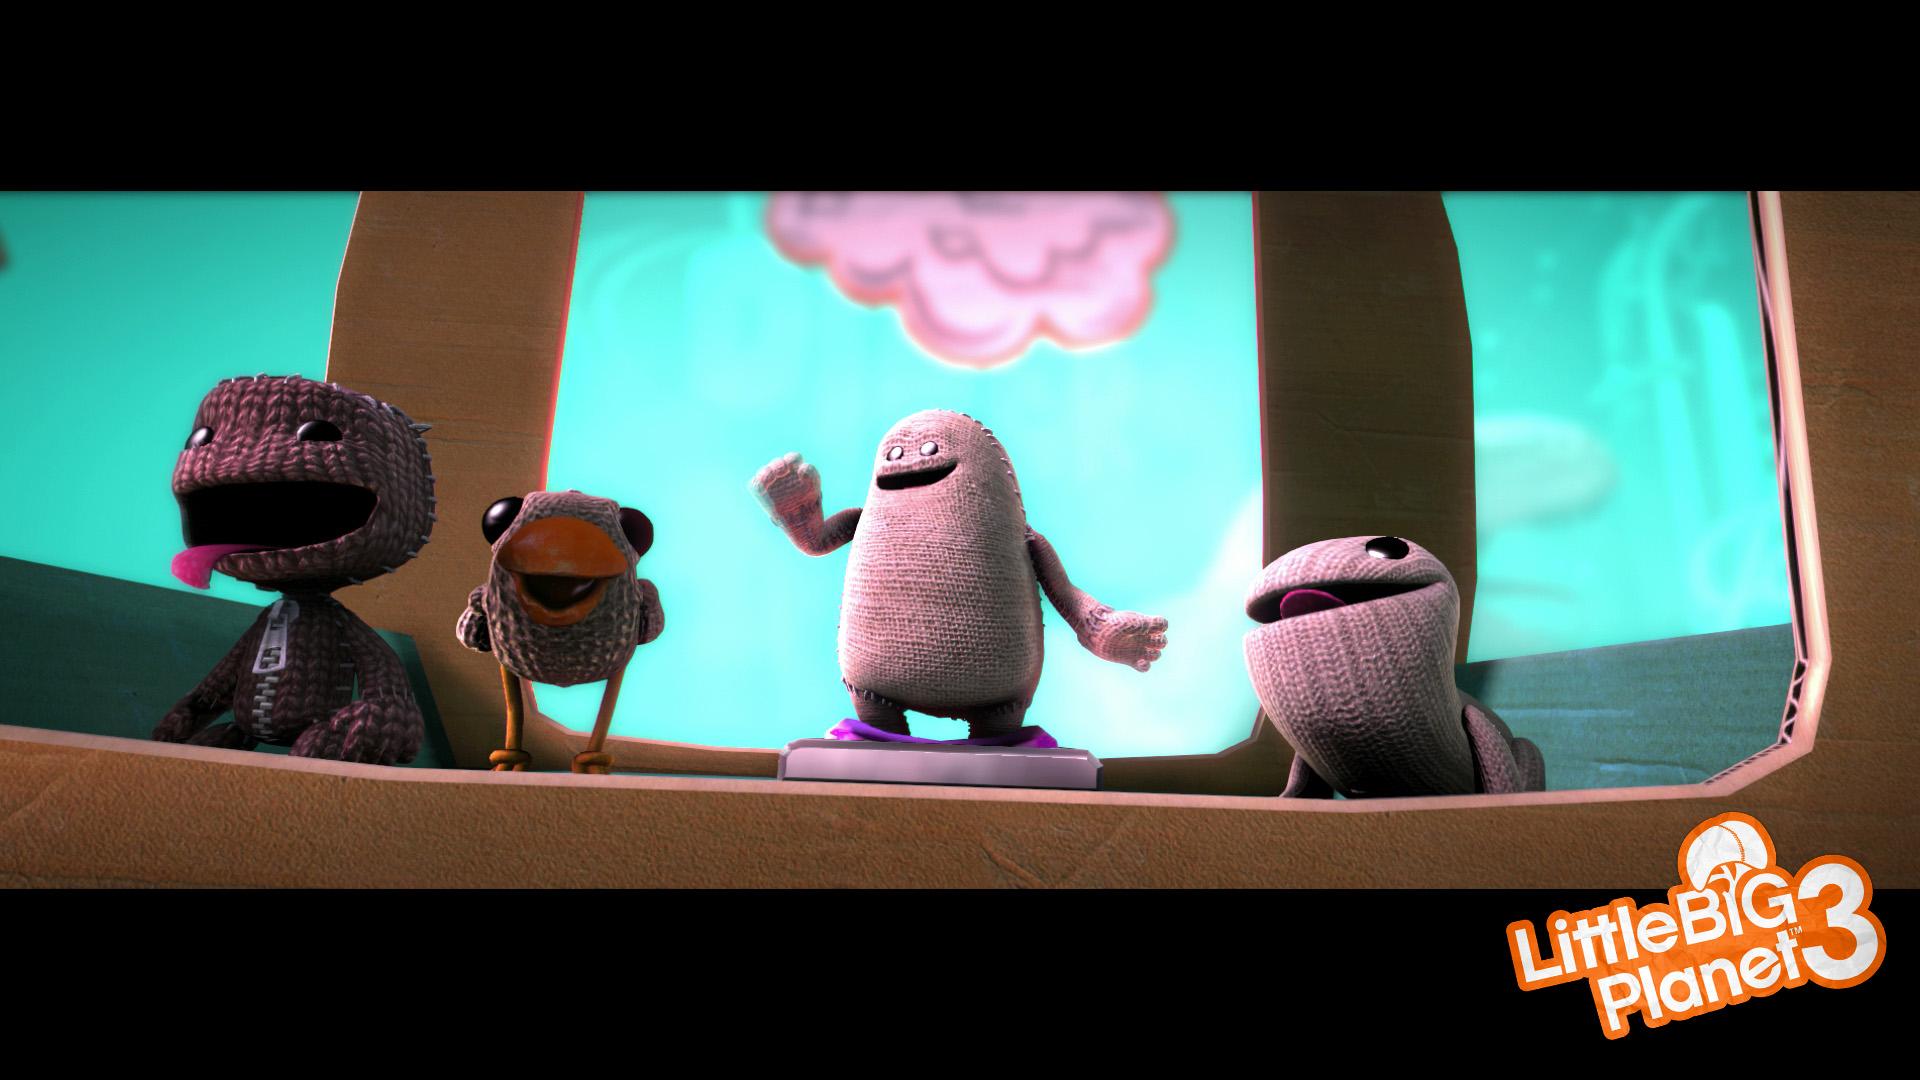 LittleBigPlanet3 PS4 Editeur 018